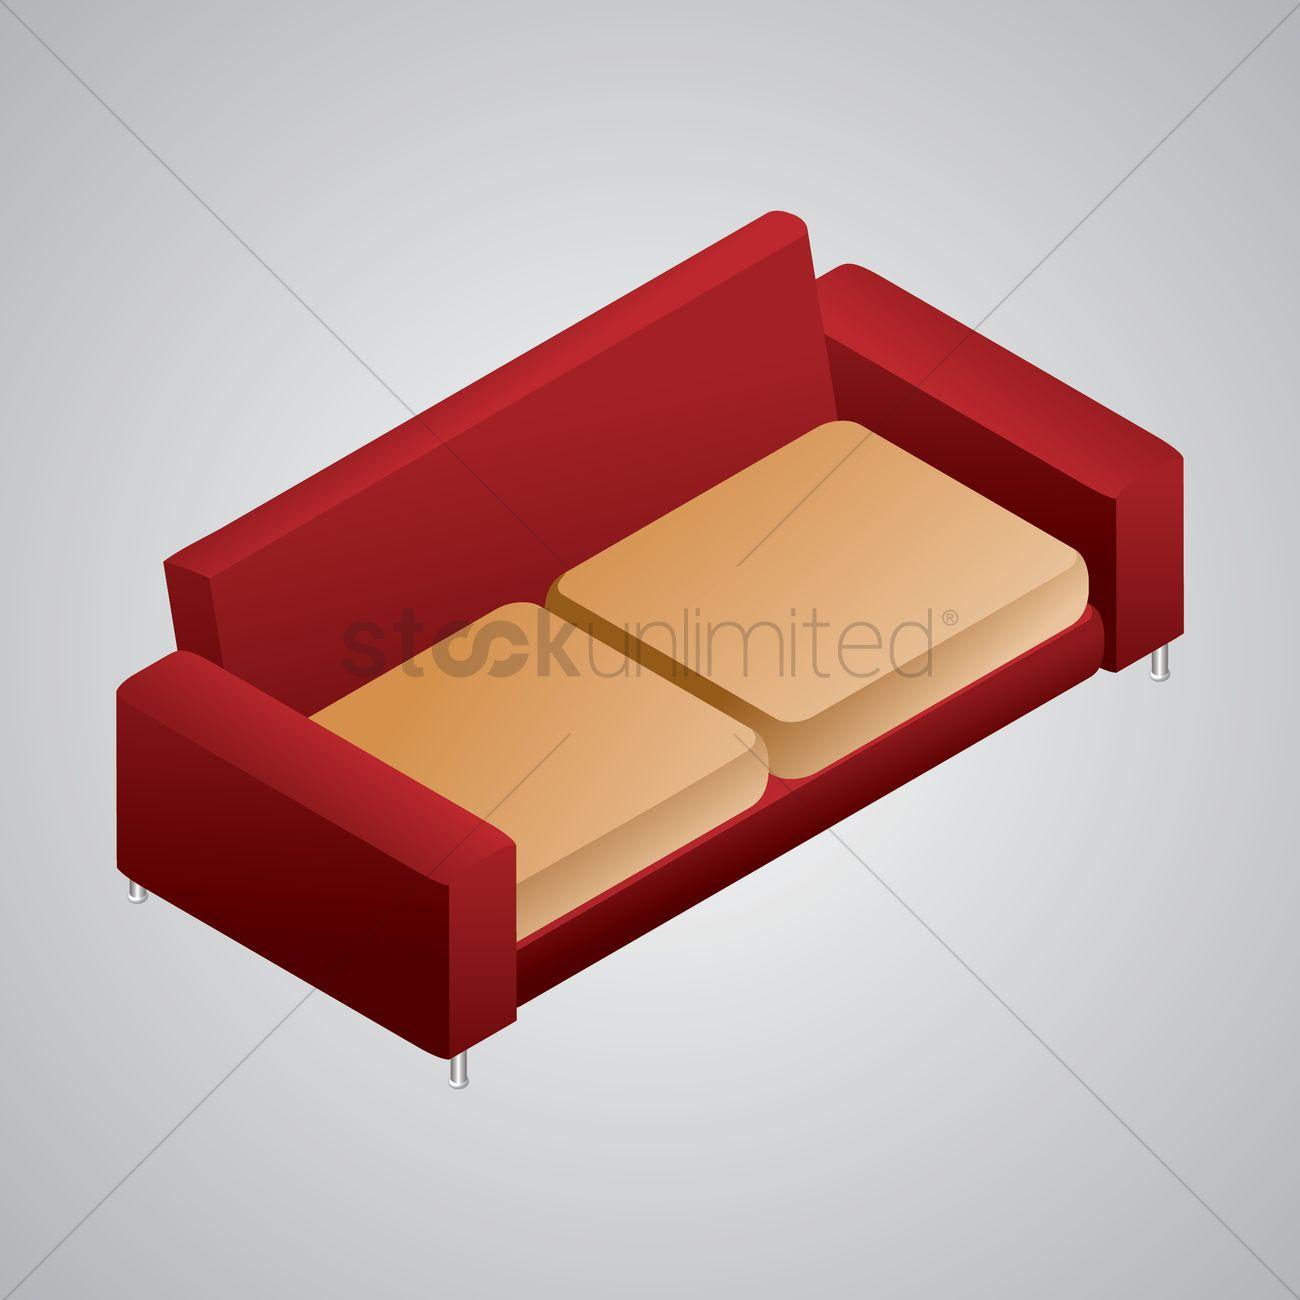 Isometric Sofa Vector Image 1608133 Stockunlimited